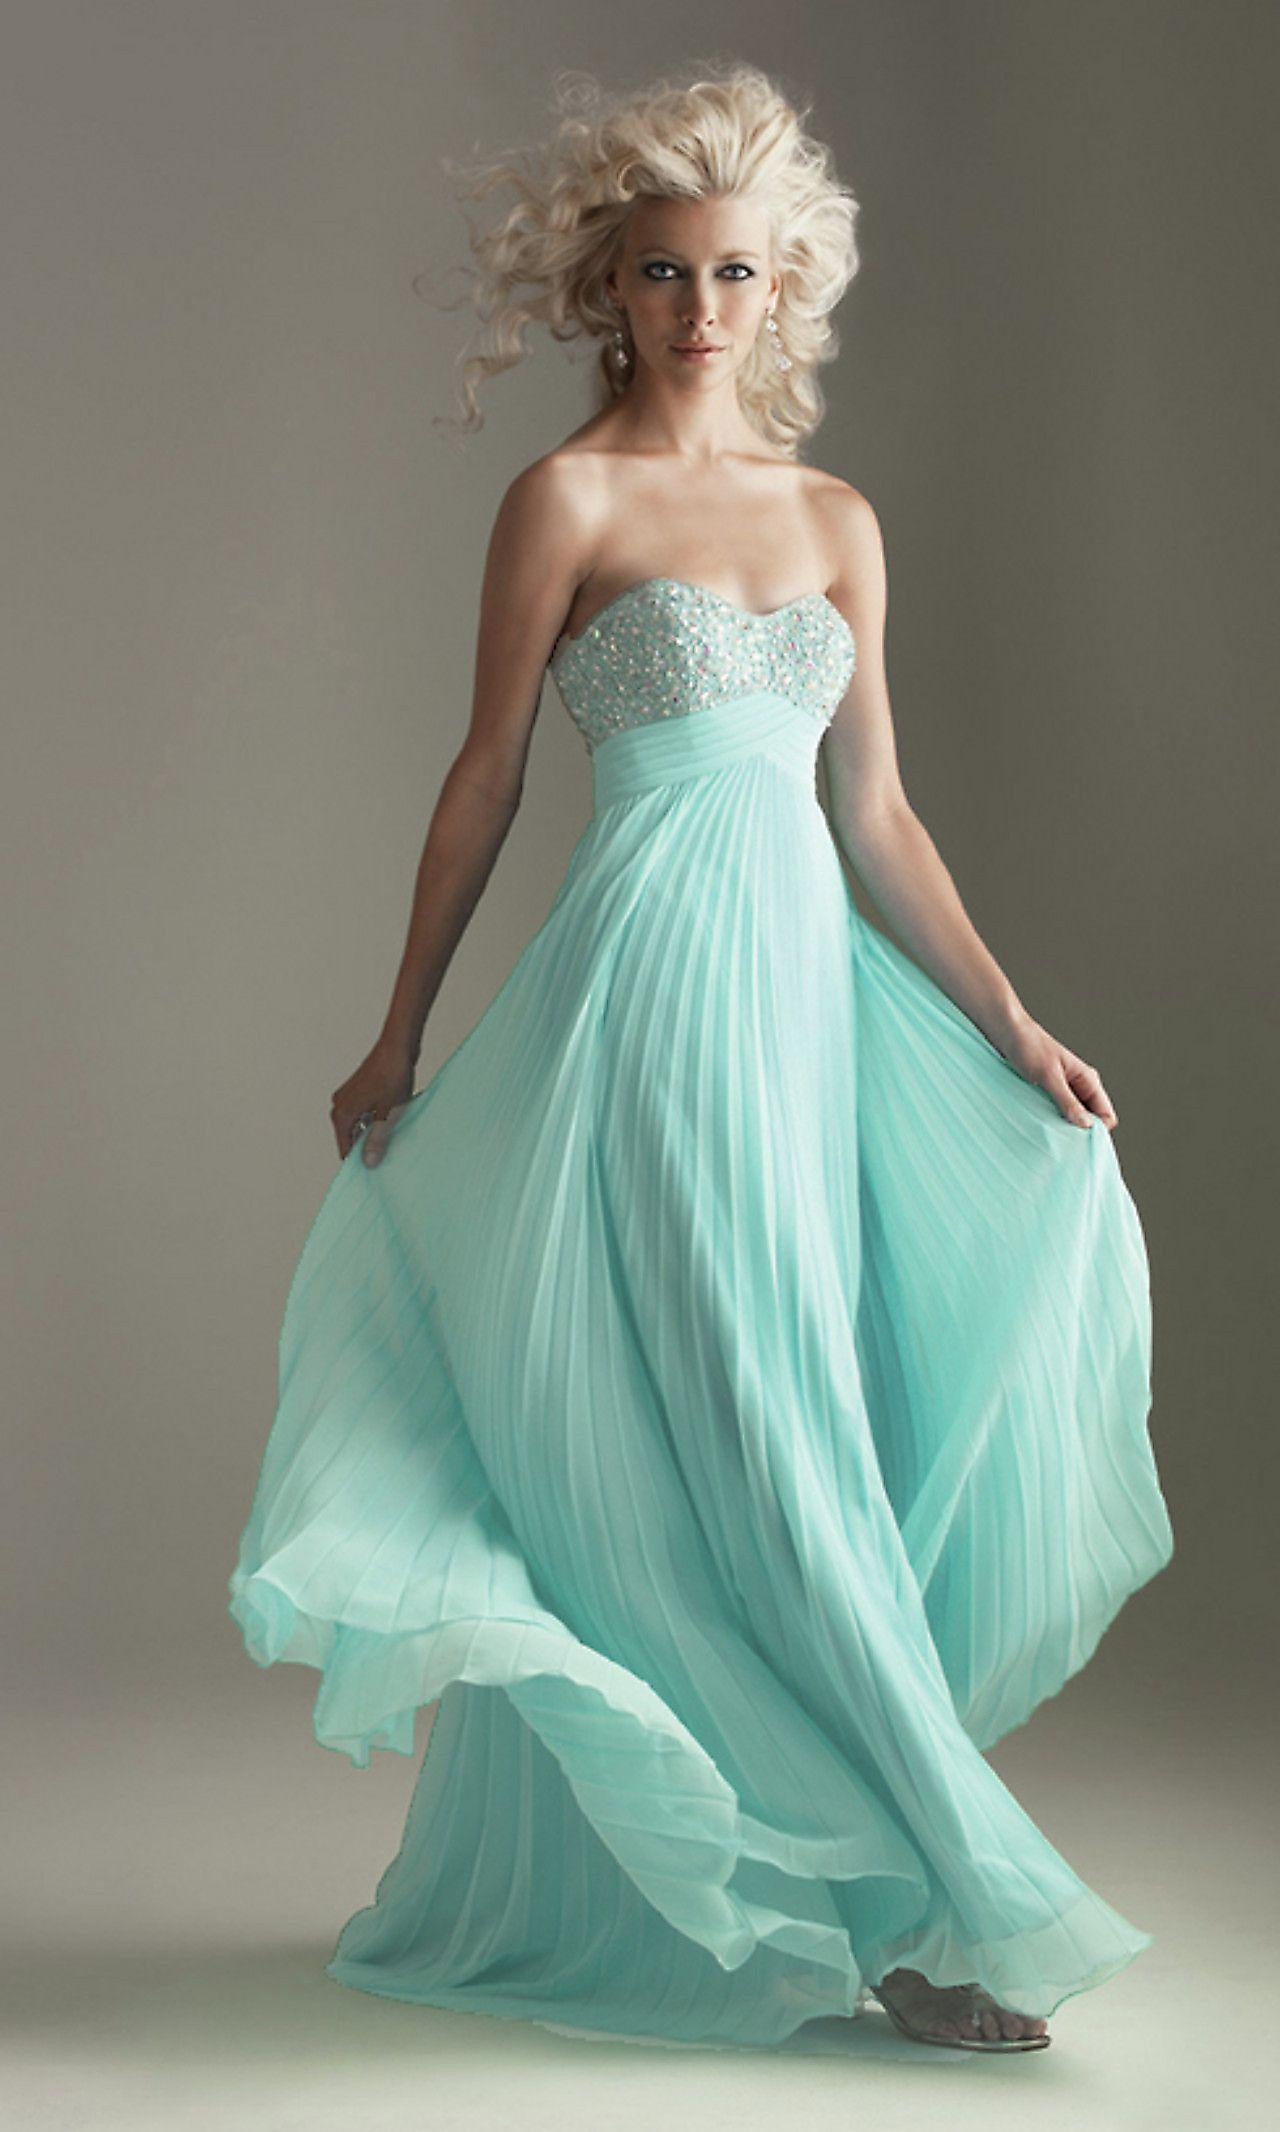 beautiful dress | Sweet Stuff! | Pinterest | Verde azulado, Azul ...